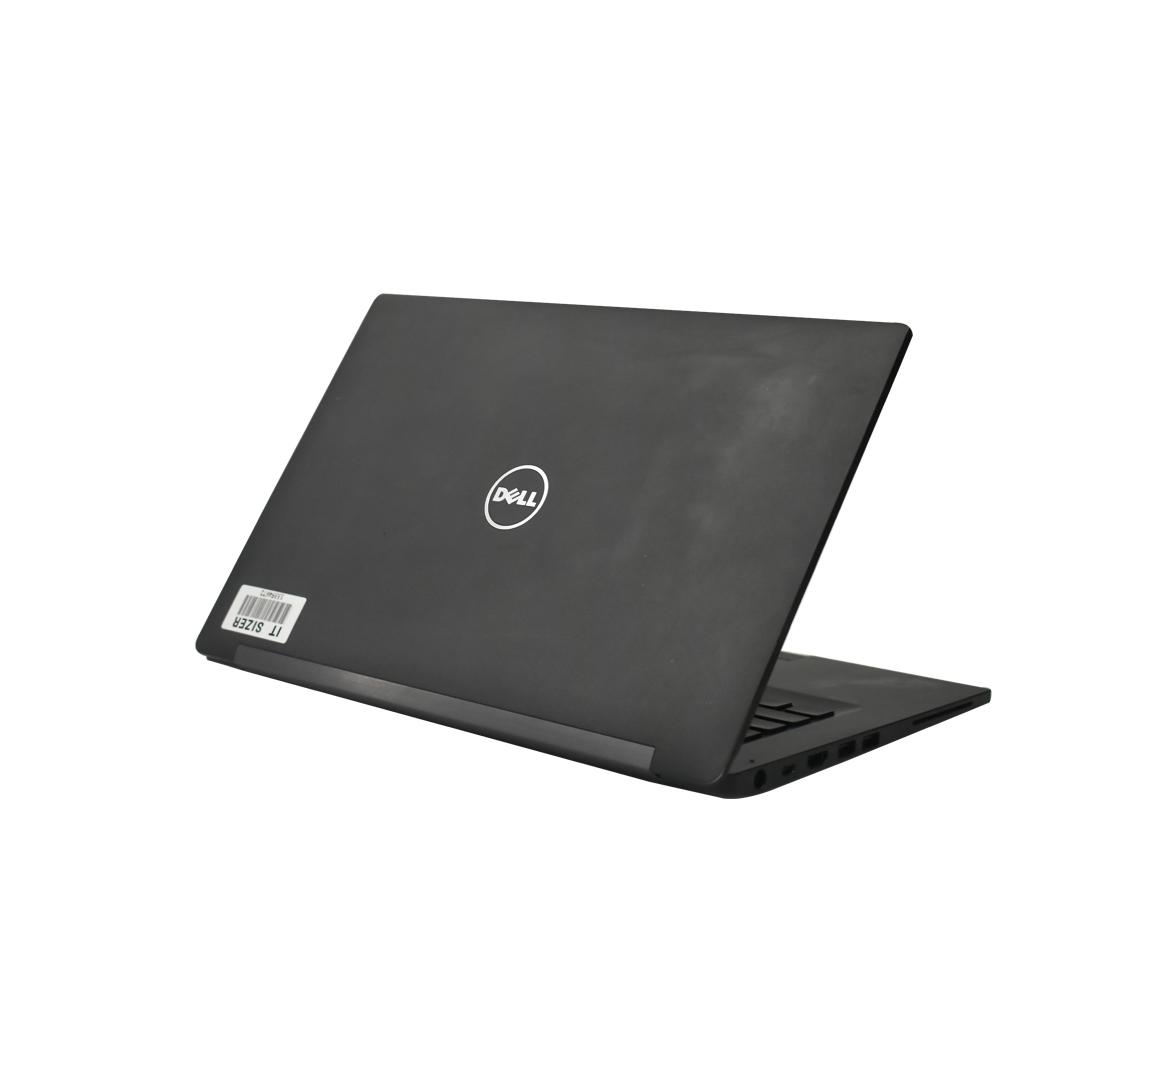 Dell latitude 7480 Business Laptop, Intel Core i7-7600U CPU, 16GB DDR4 SODIMM RAM, 512GB SSD, 14 inch Touch Display, Windows 10 Pro (Refurbished)